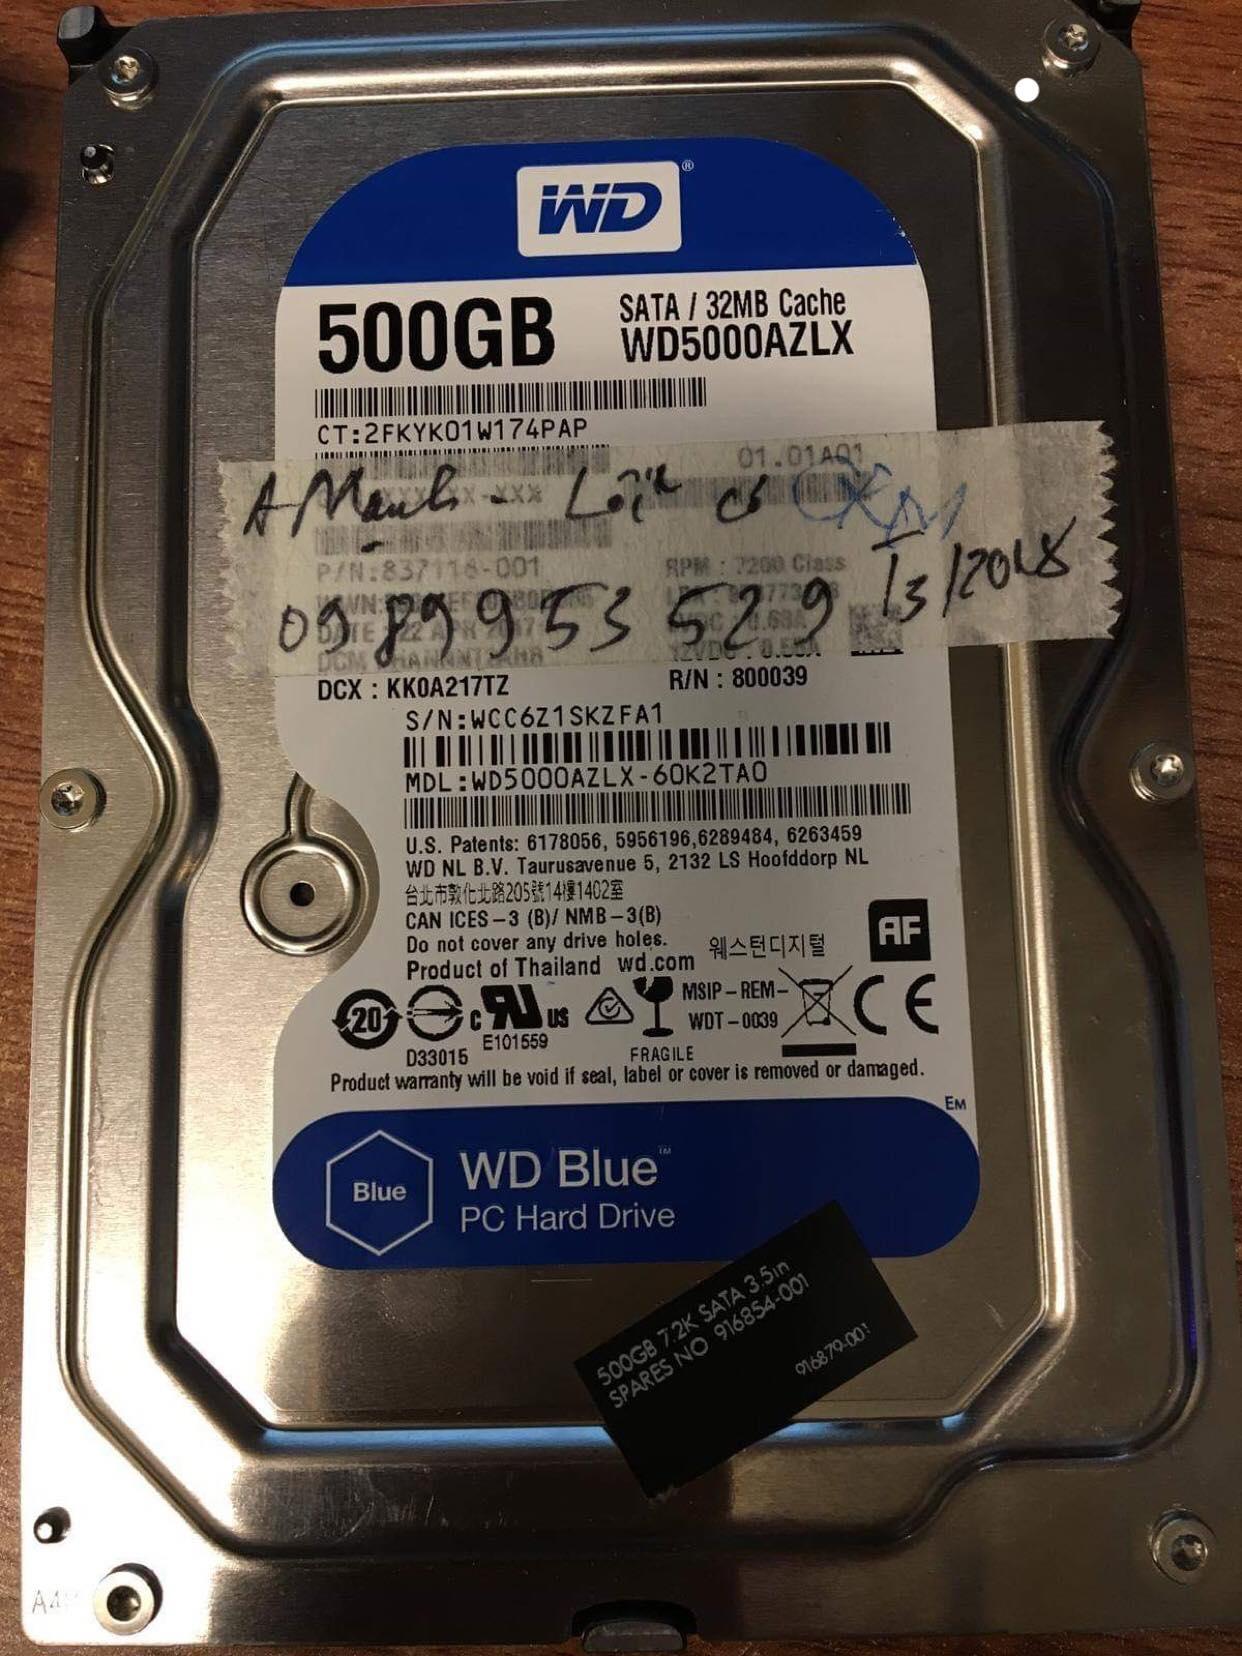 Cứu dữ liệu ổ cứng Western 500GB lỗi cơ 29/01/2019 - cuumaytinh